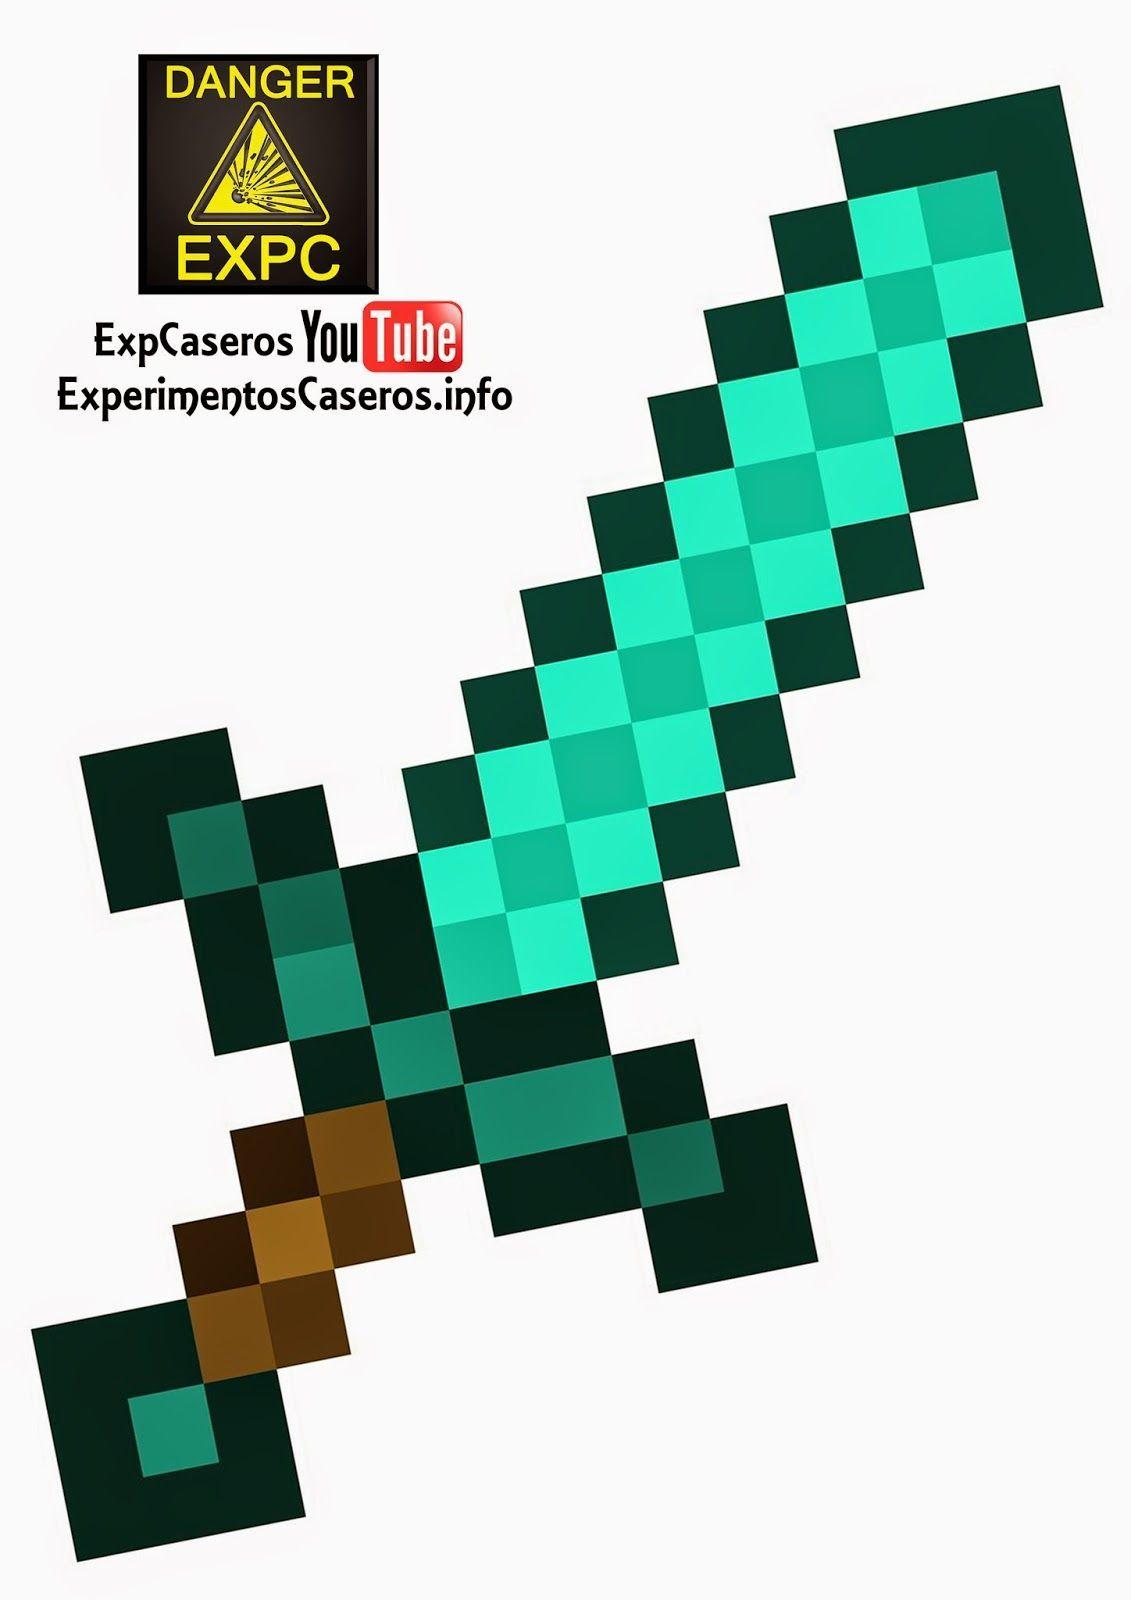 Gadgets Espada Minecraft Espada De Minecraft Papercraft Minecraft Fiesta De Cumpleanos Minecraft In 2020 Minecraft Printables Minecraft Sword Minecraft Templates